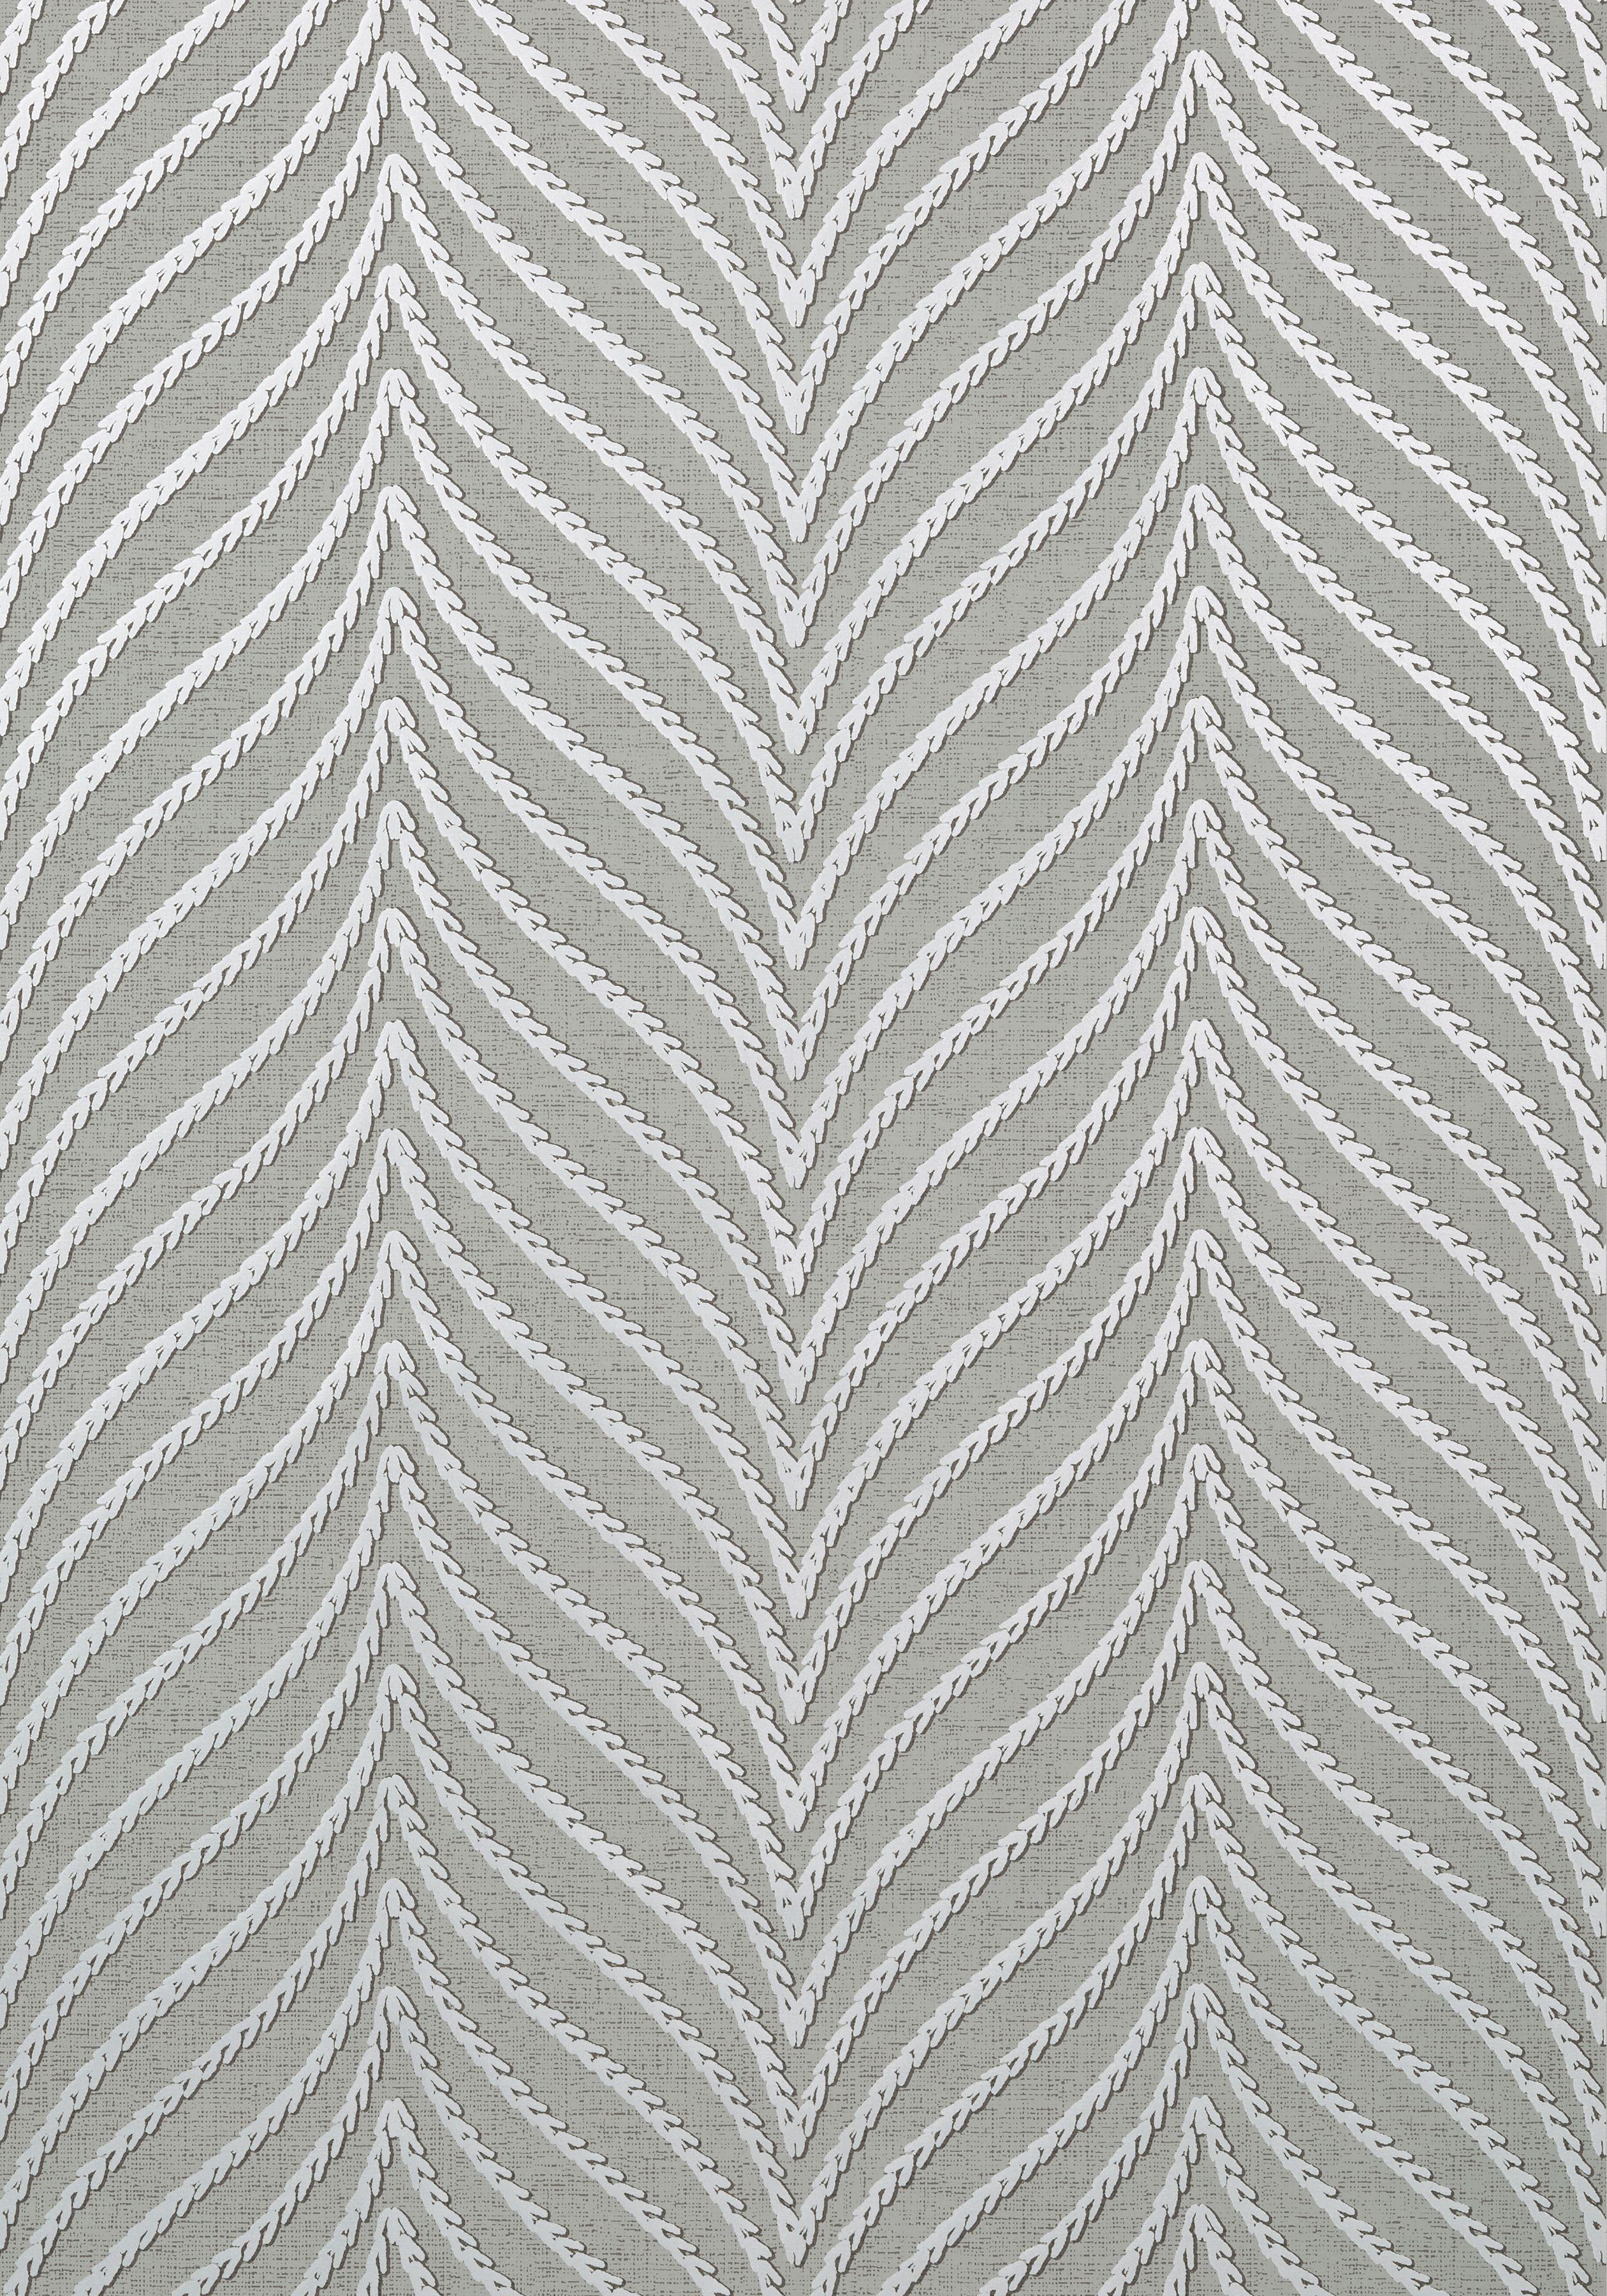 Clayton Herringbone Metallic Silver On Charcoal T75501 Collection Dynasty From Thibaut Herringbone Wallpaper Thibaut Wallpaper Aqua Wallpaper